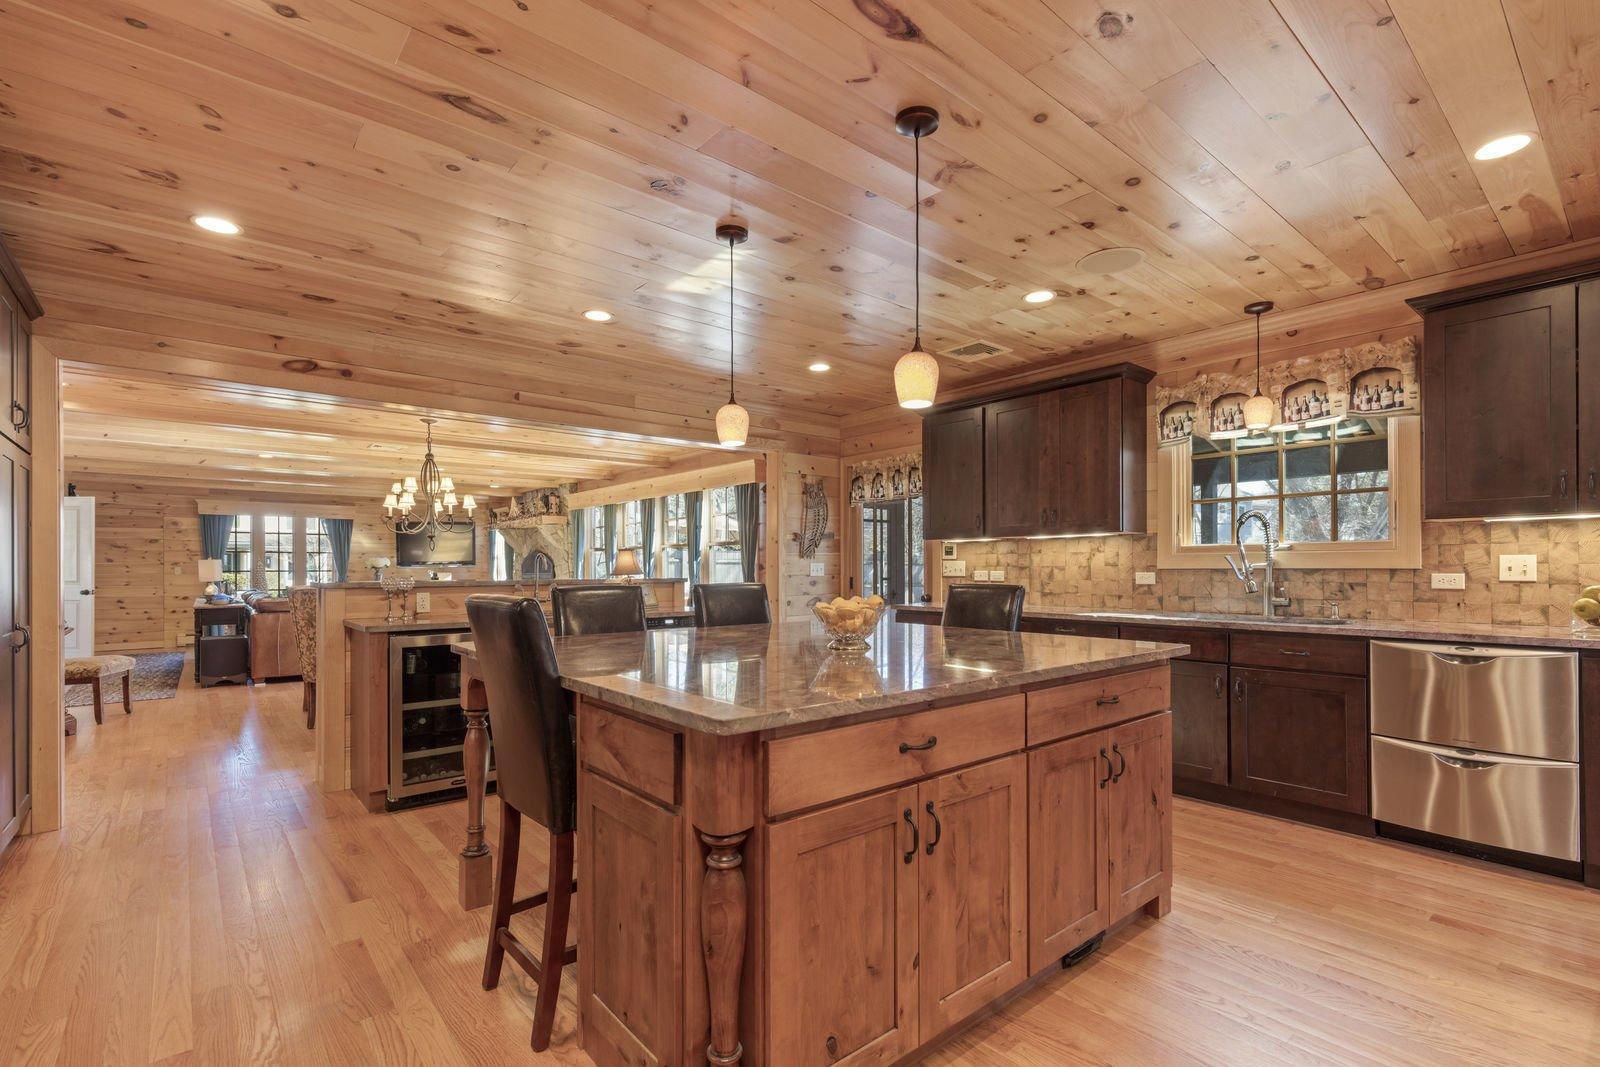 Kitchen, Wood Cabinet, Wine Cooler, Granite Counter, Dishwasher, and Medium Hardwood Floor  Shingle Style Rustic Chic